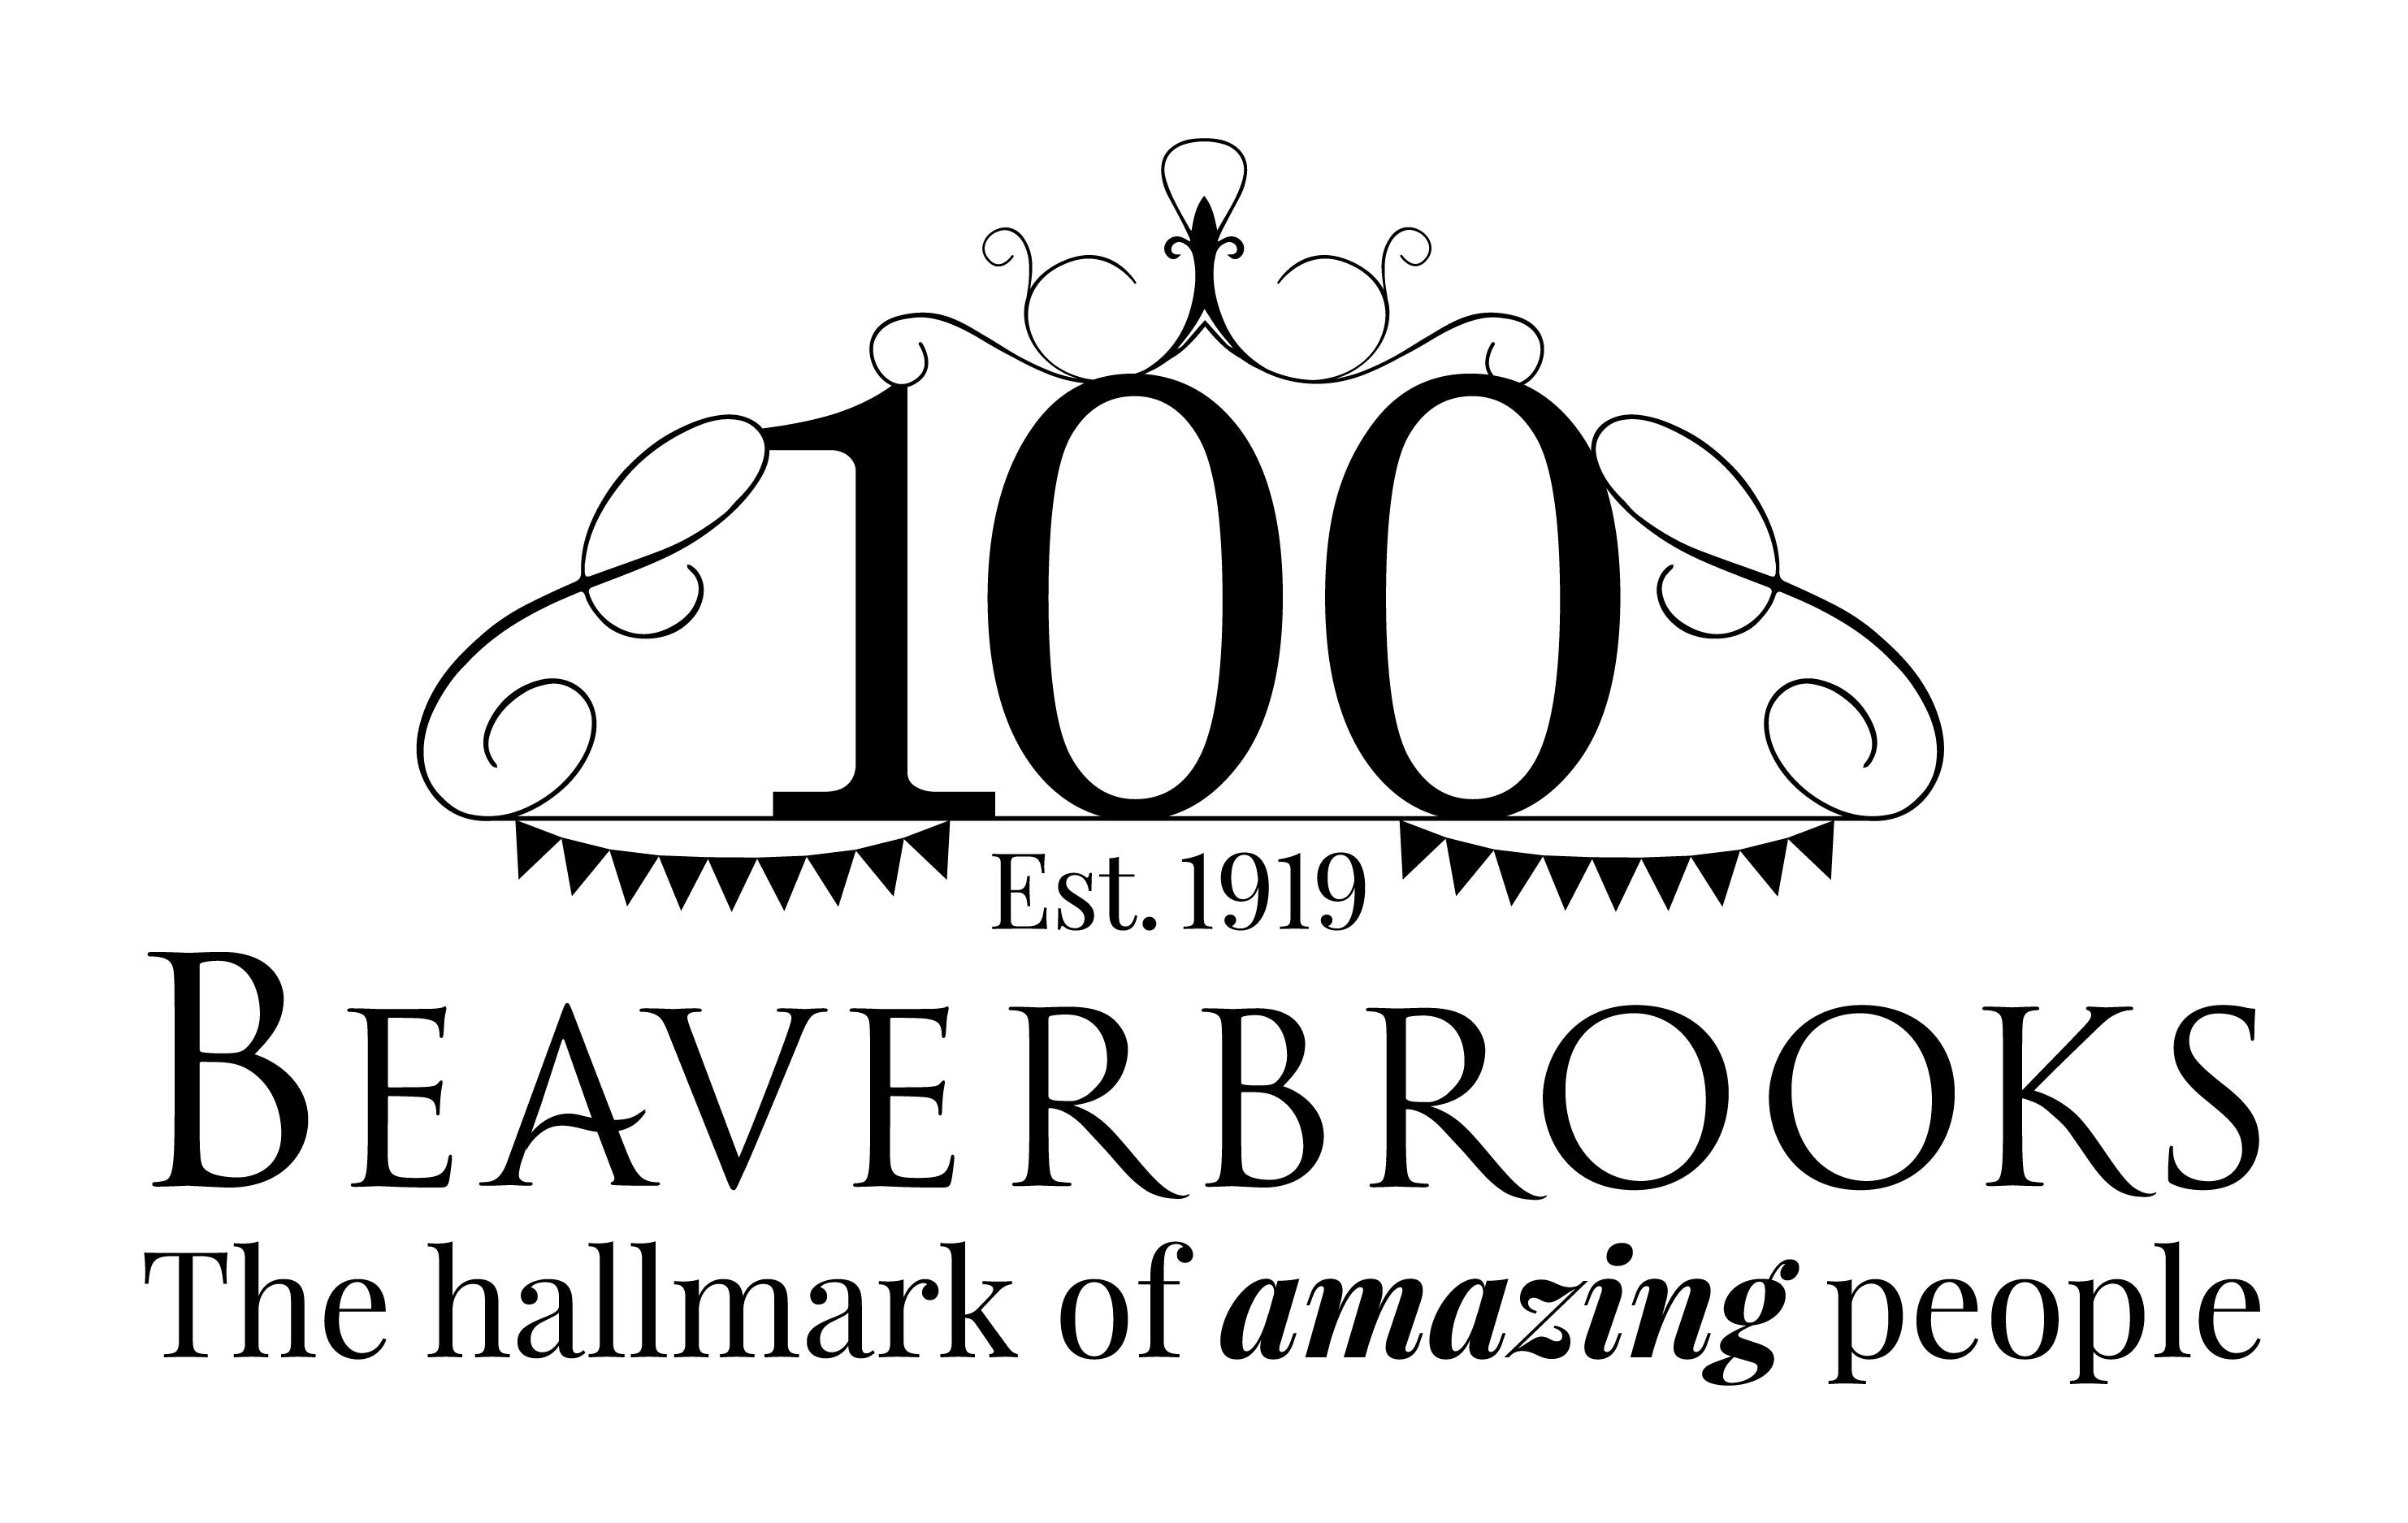 Beaverbrooks 100 year